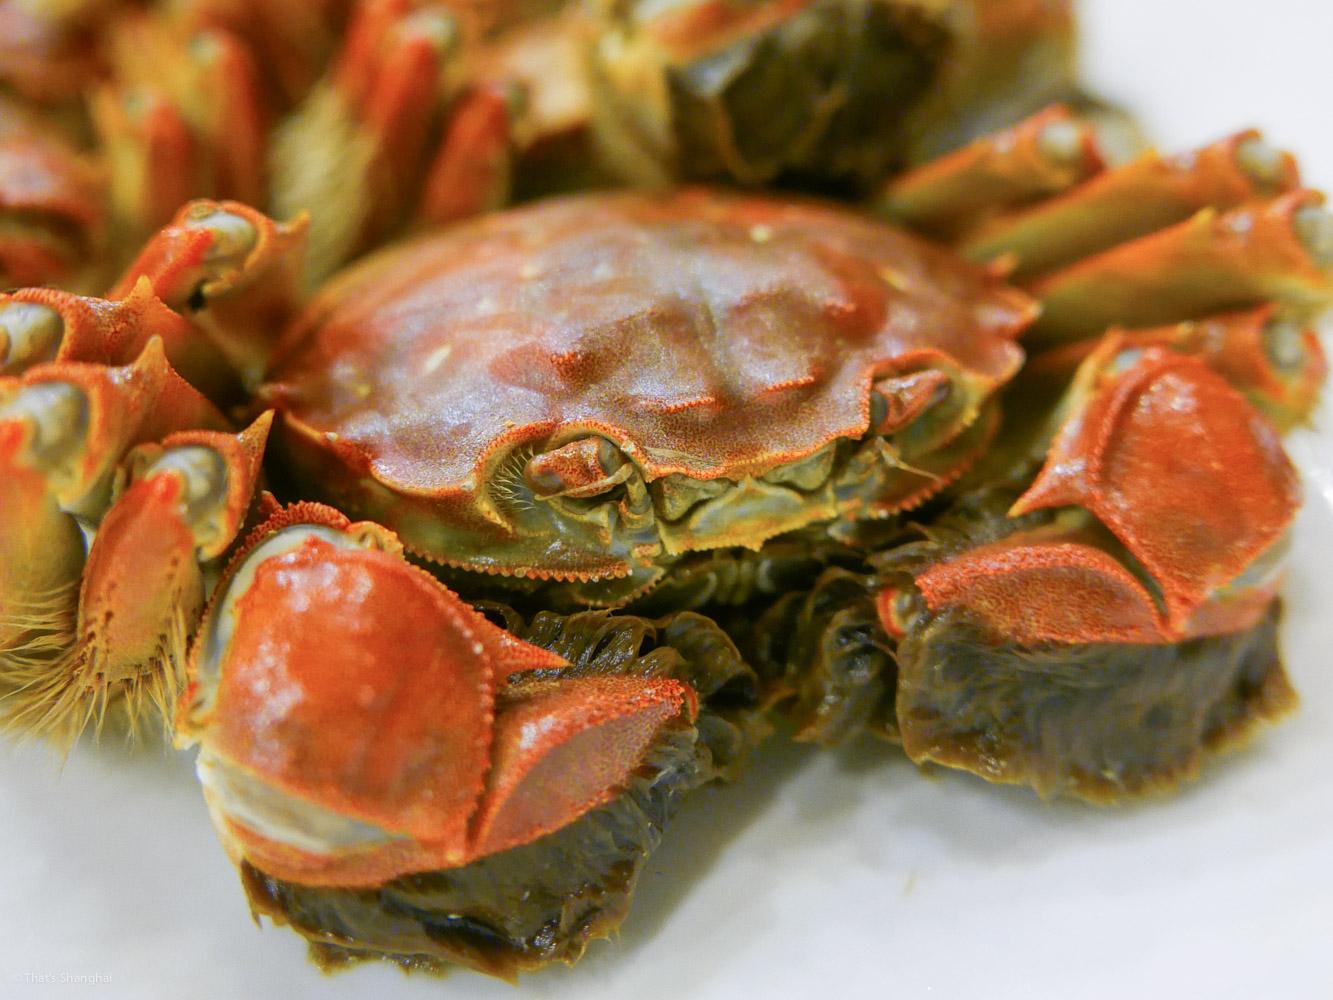 Hairy Crab in Shanghai